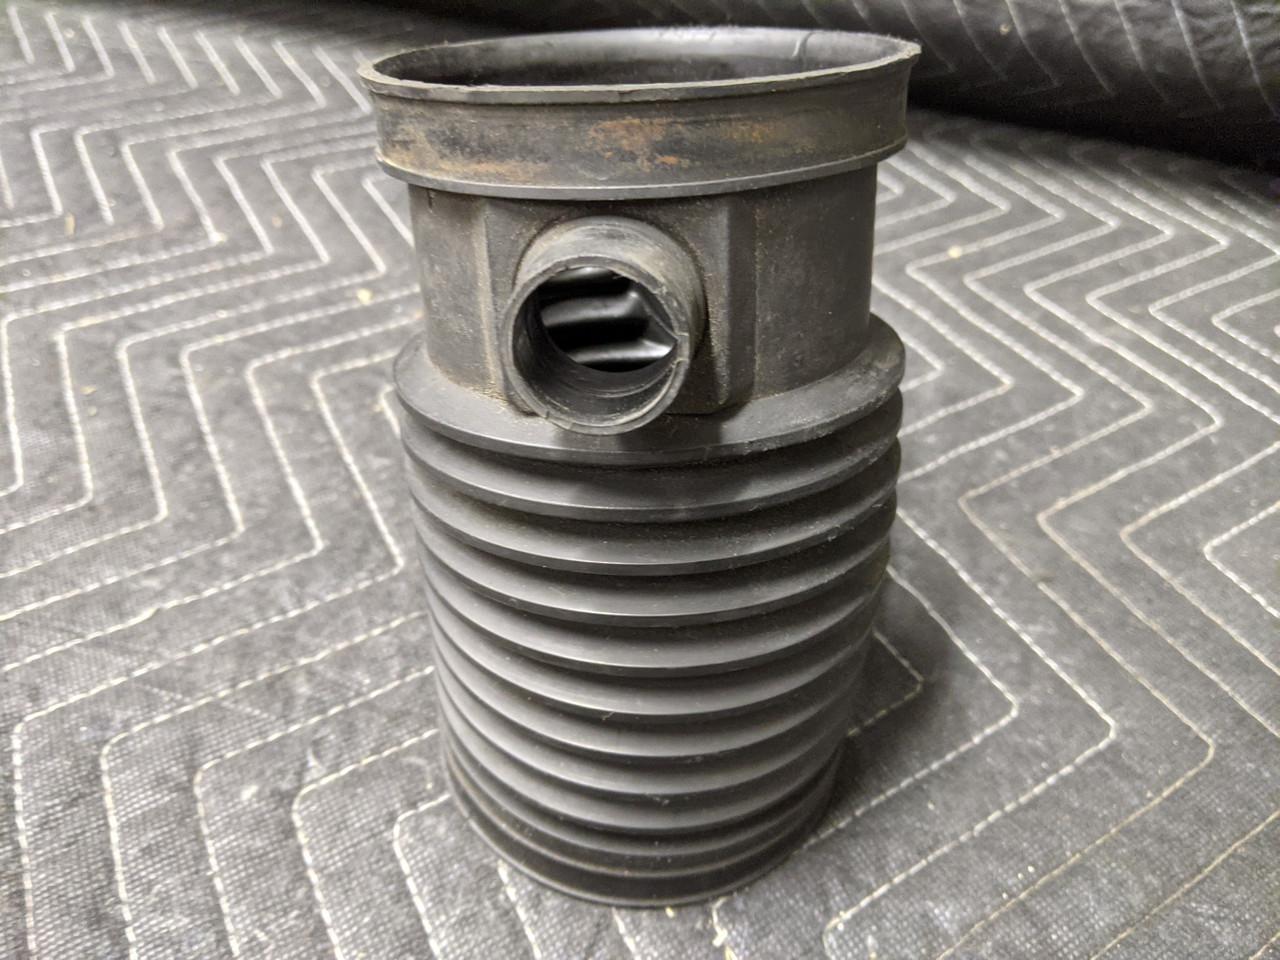 BMW E38/E39 5-Series 7-Series Rubber Intake Boot 13711432410